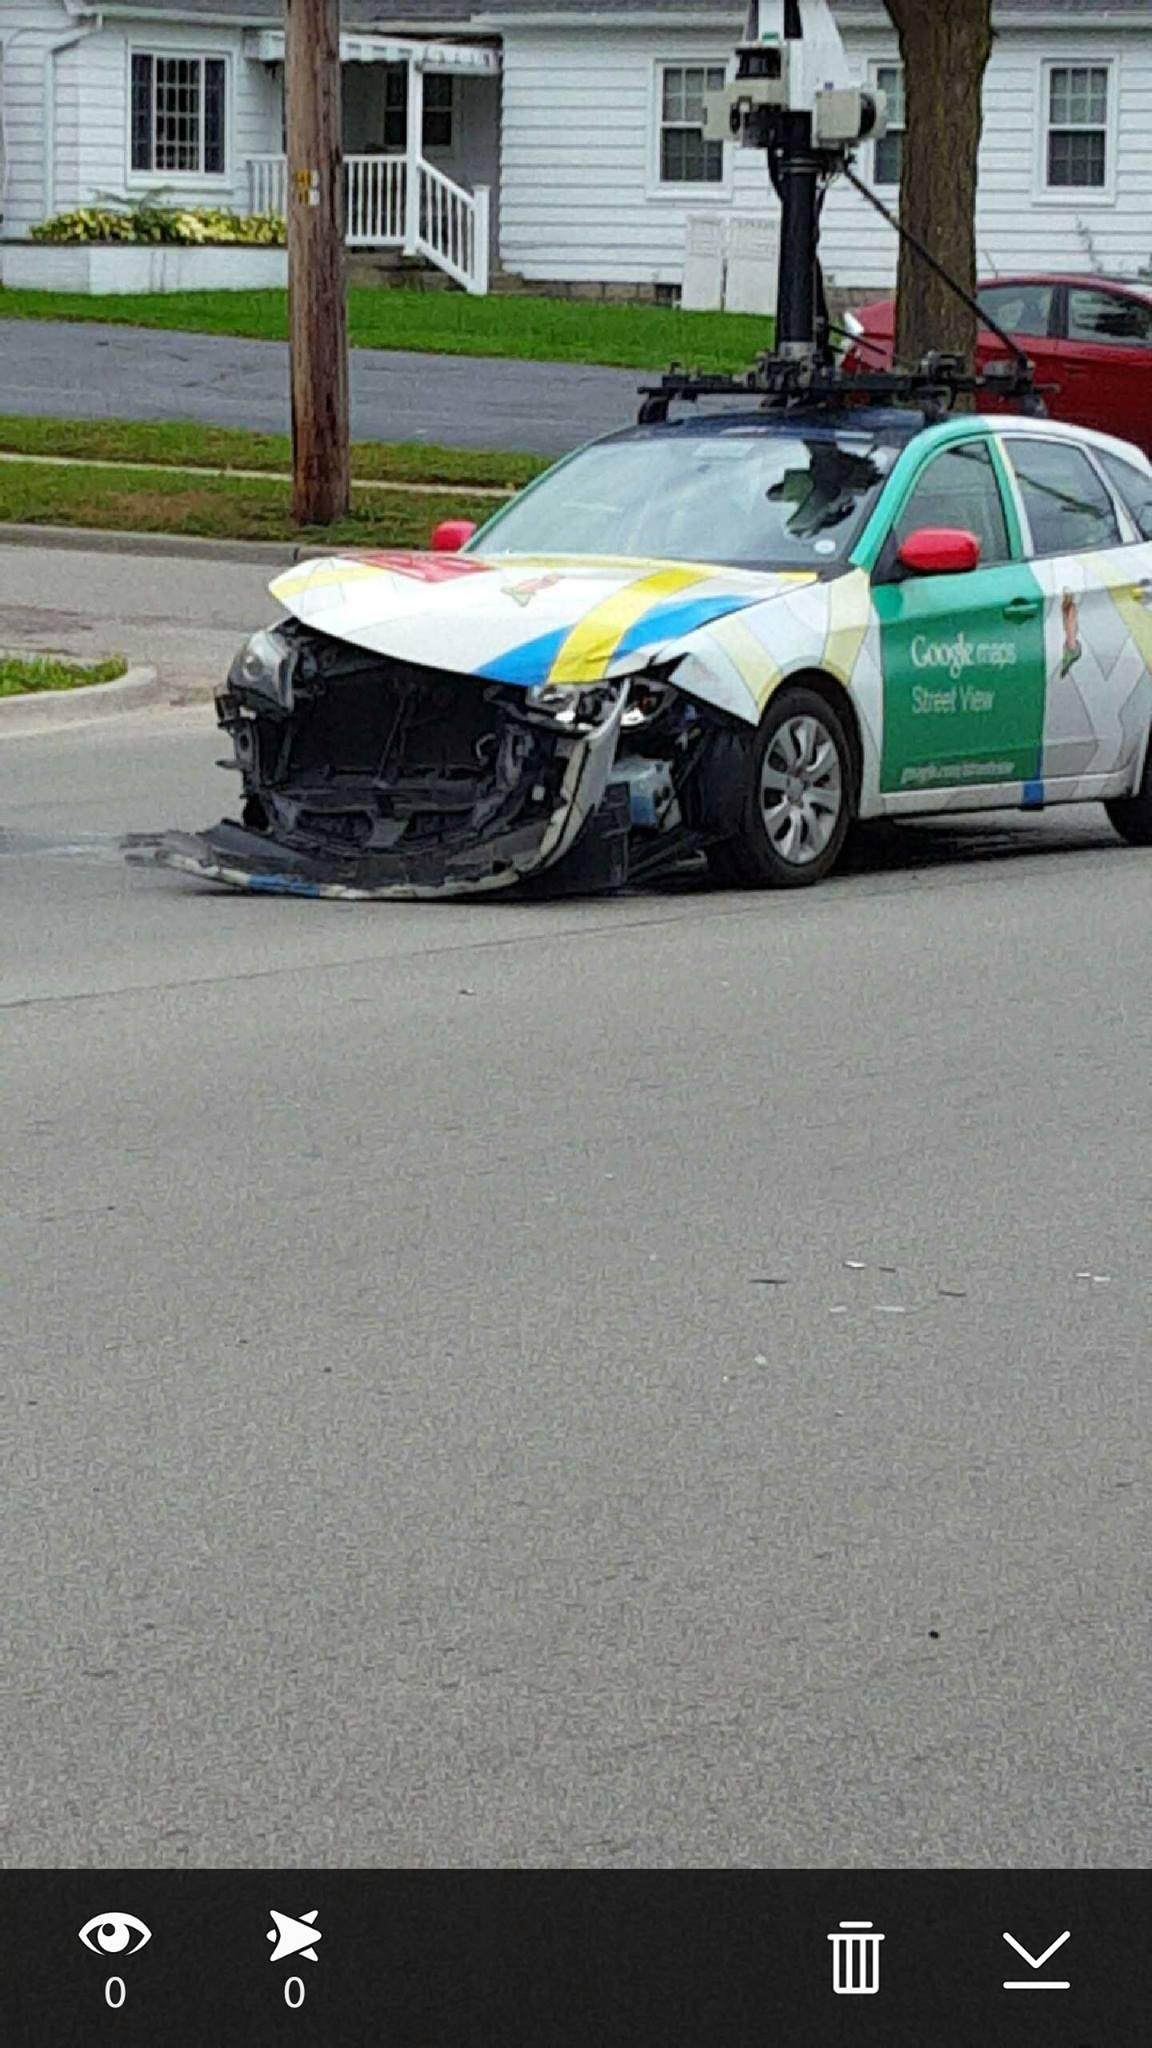 First Team Subaru >> A Google Street View Car Crashes, Shows Why Google Wants Driverless Tech - autoevolution